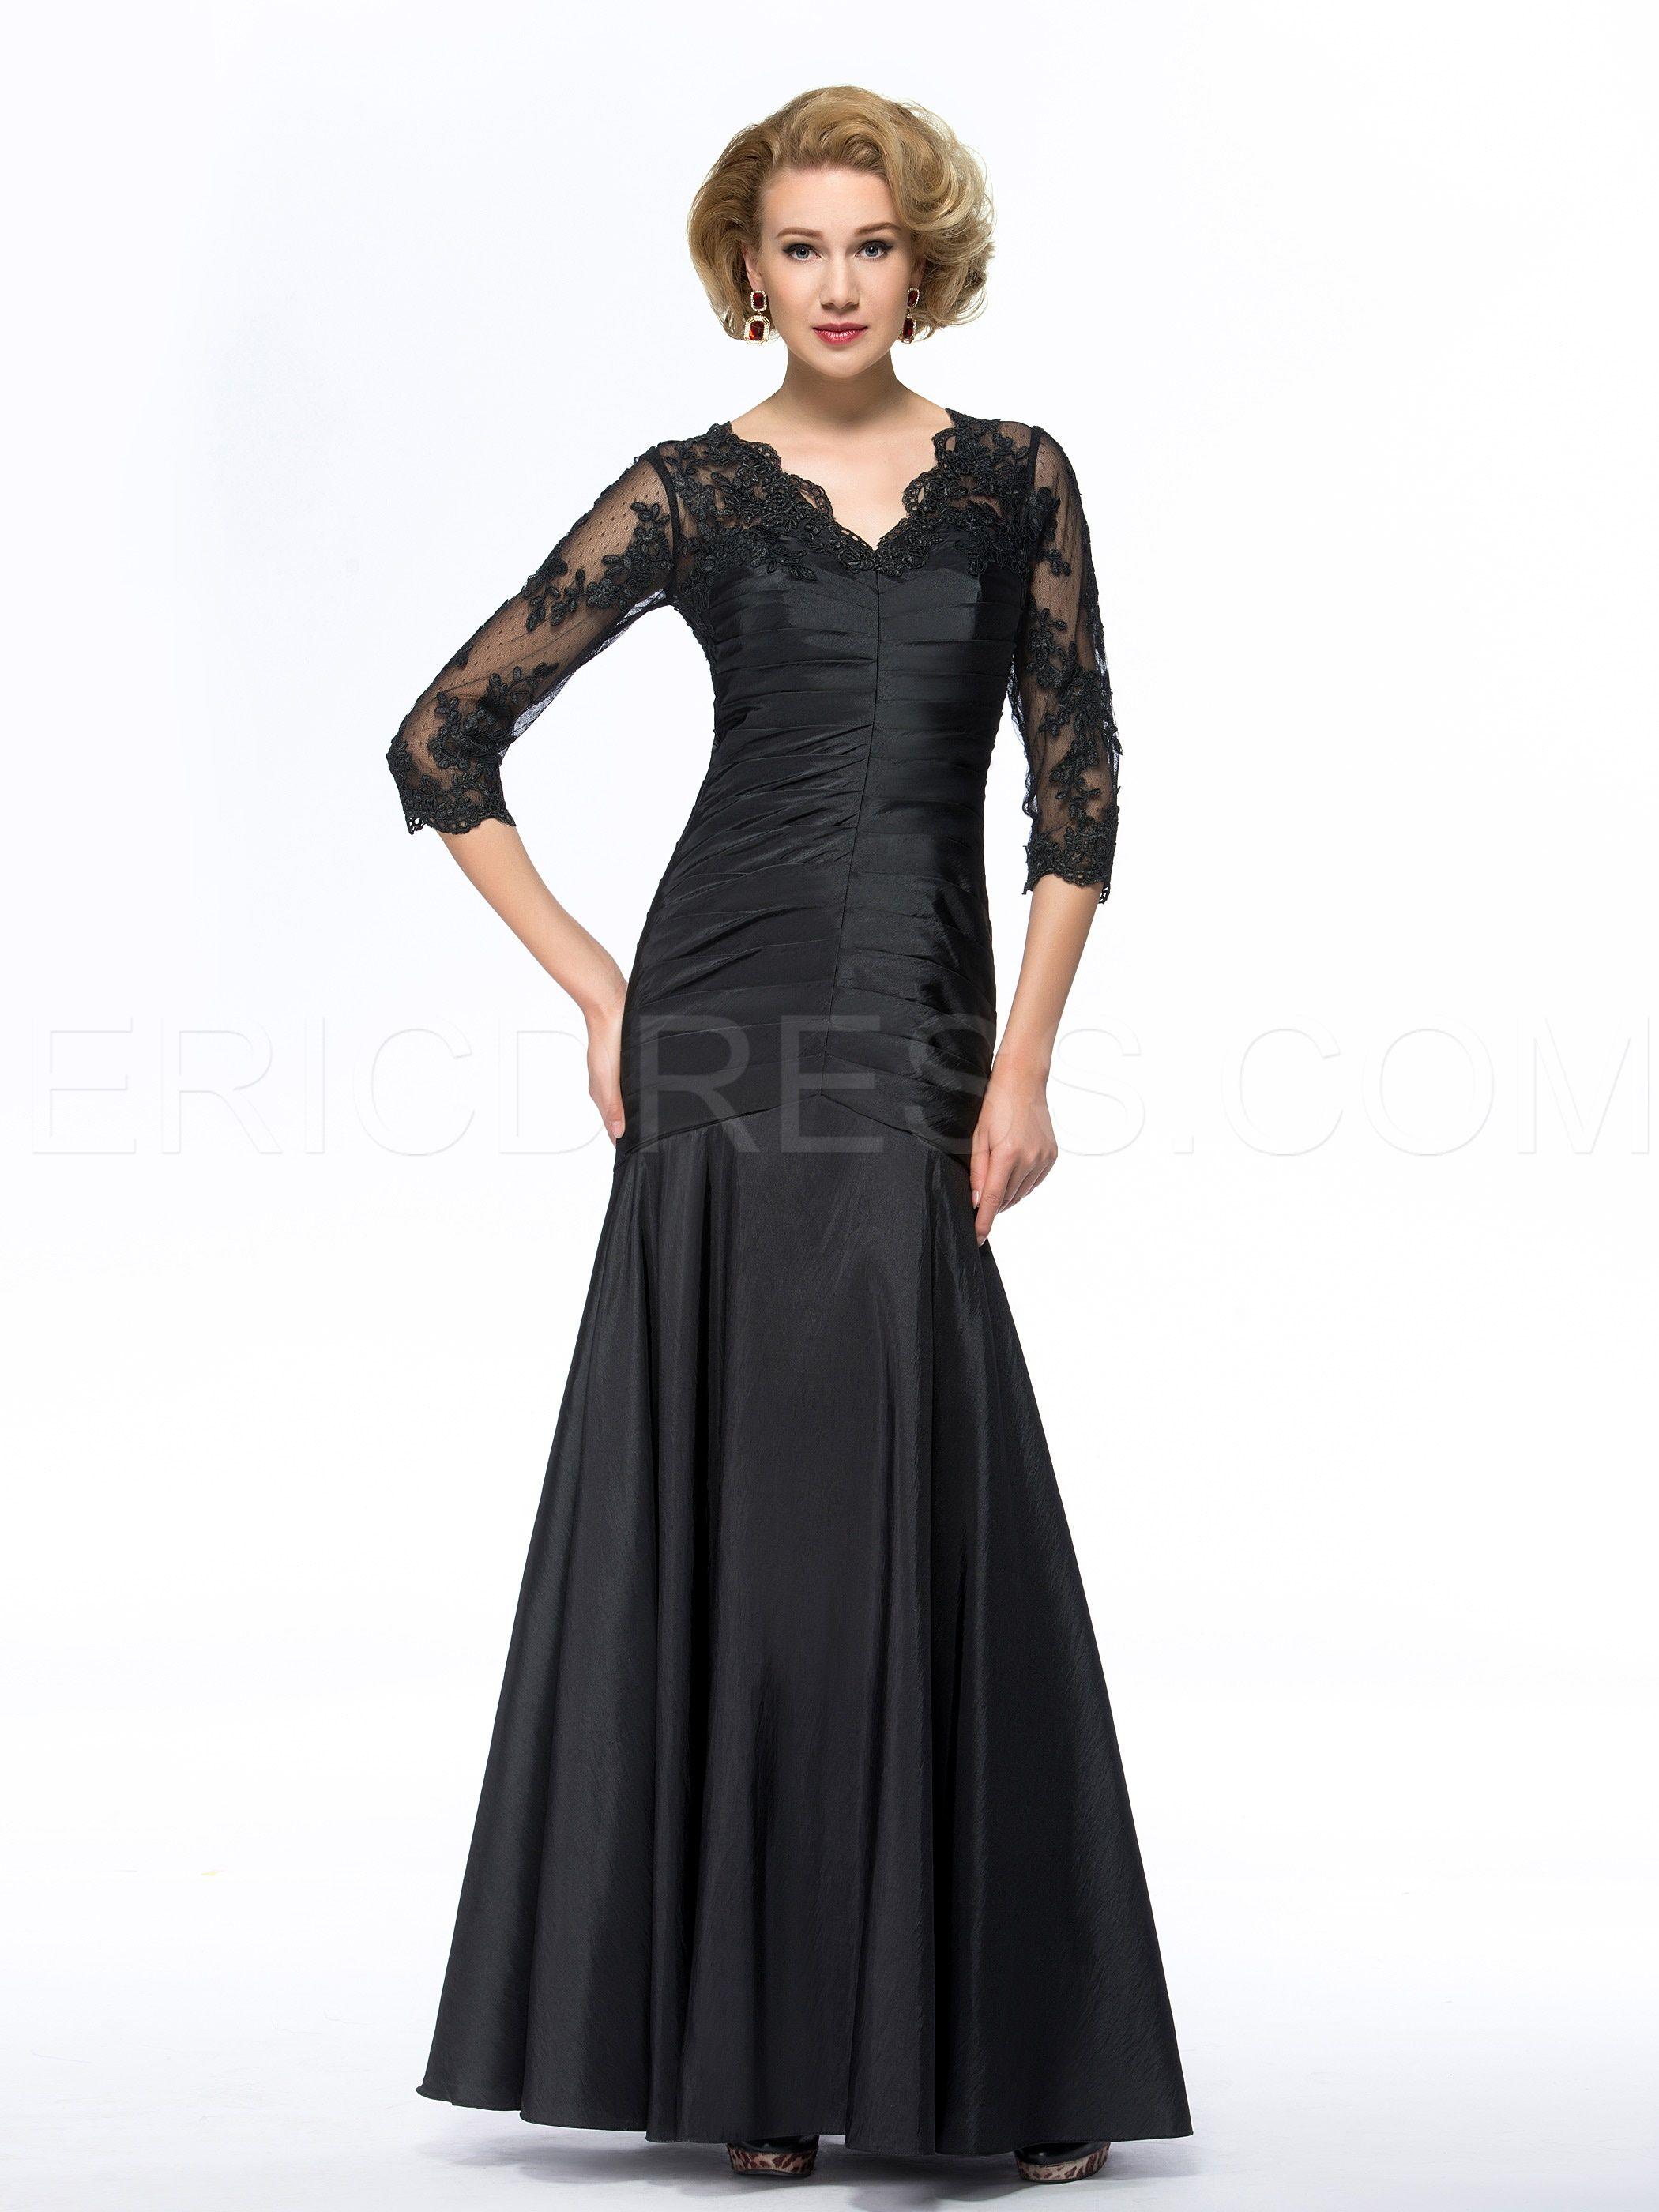 Mothers dresses for a wedding  Vintage VNeck Appliques Ruched Length Long Sleeves Mother of